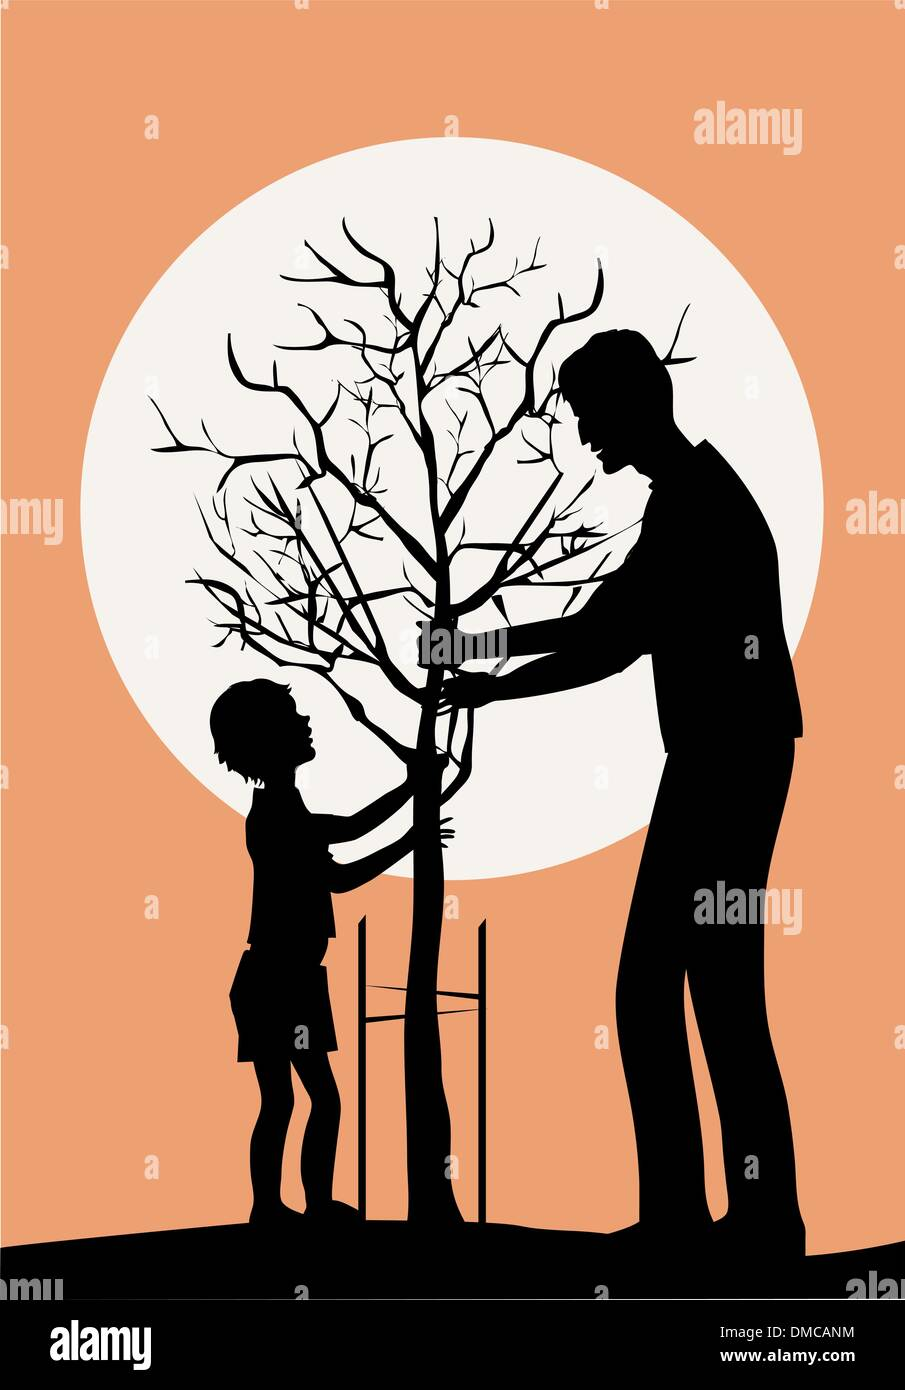 Plantación de árbol Imagen De Stock